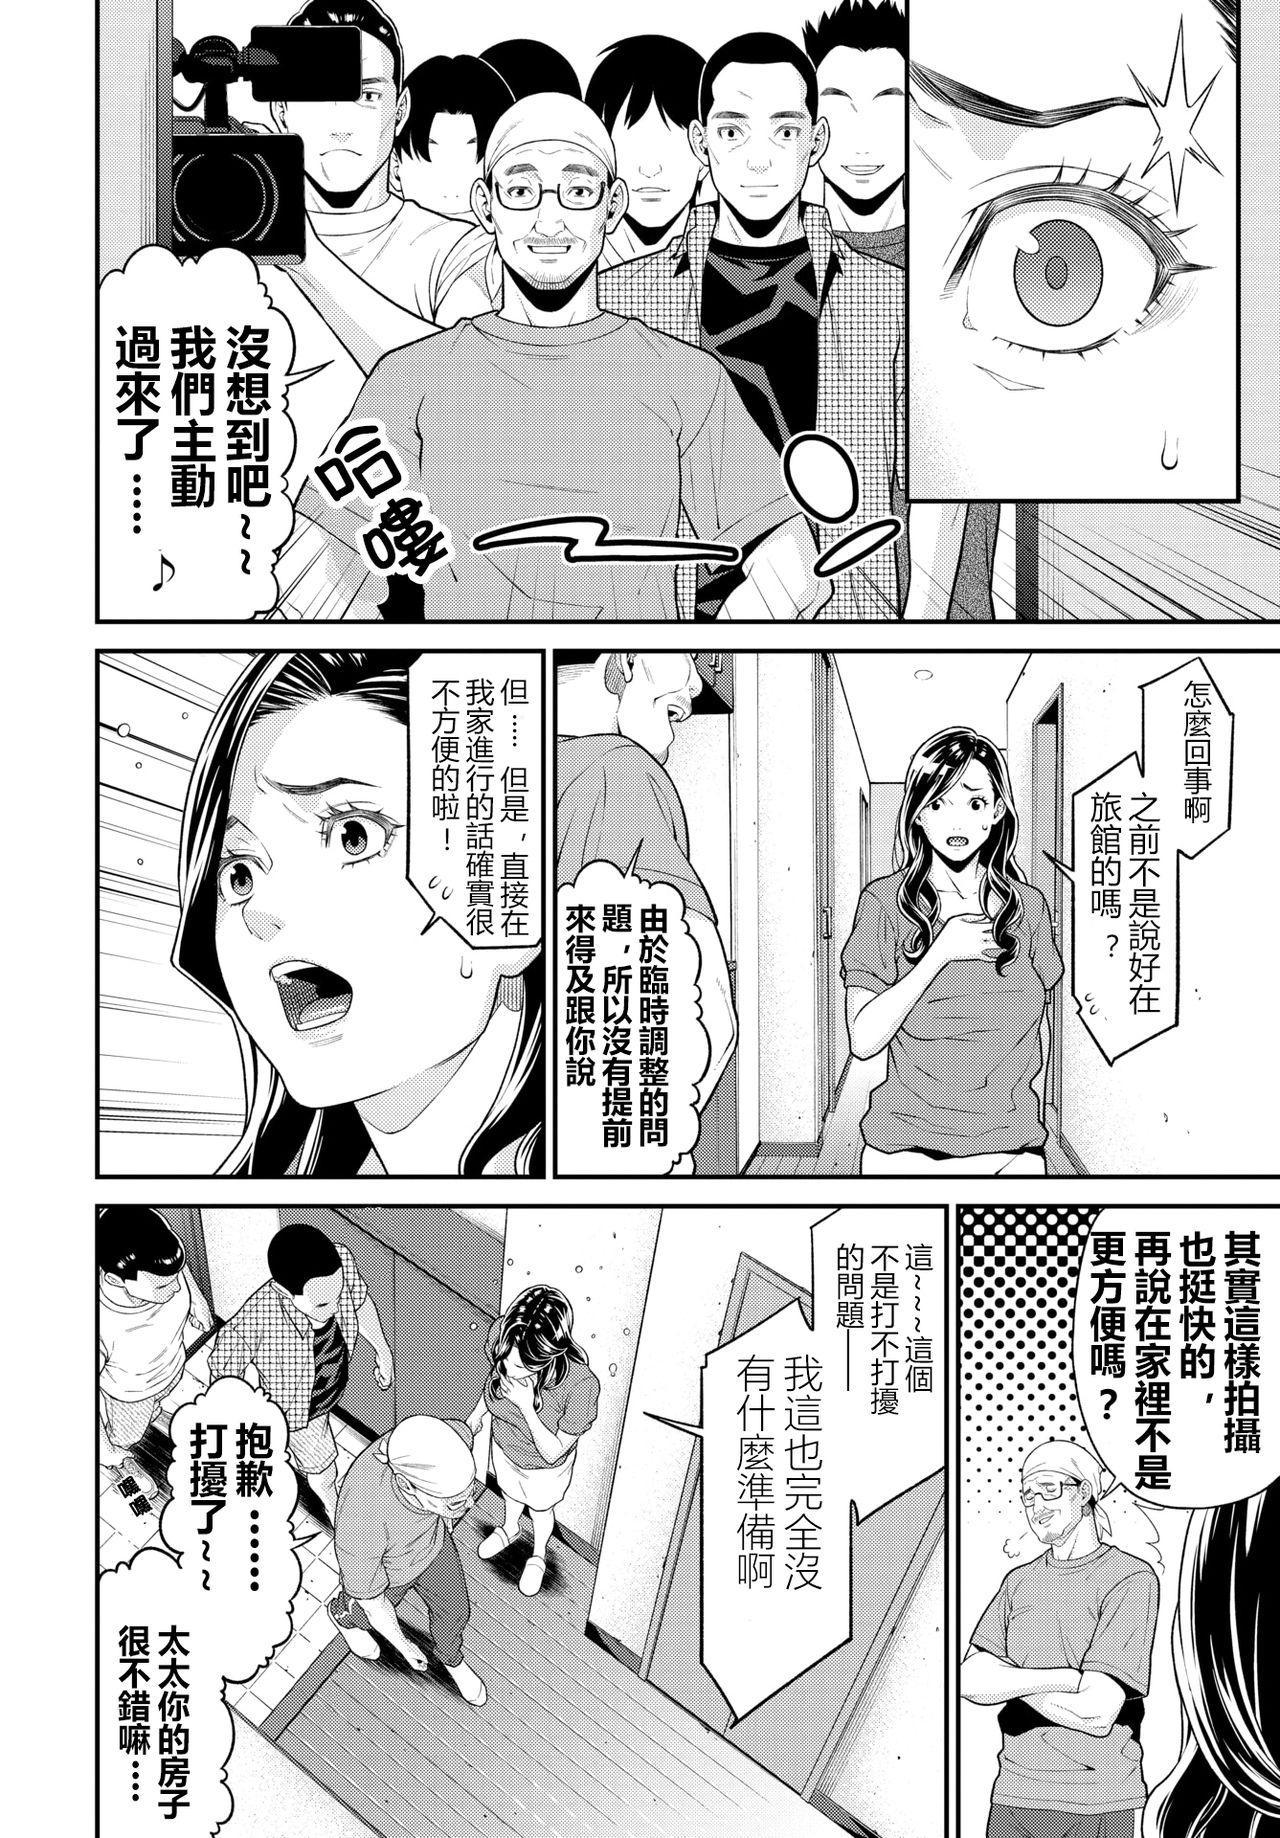 [Syuuen] Secret Wife  1-6 [Chinese][鼠灣漢化](210206最新修复完整版)【極品人妻NTR】 52